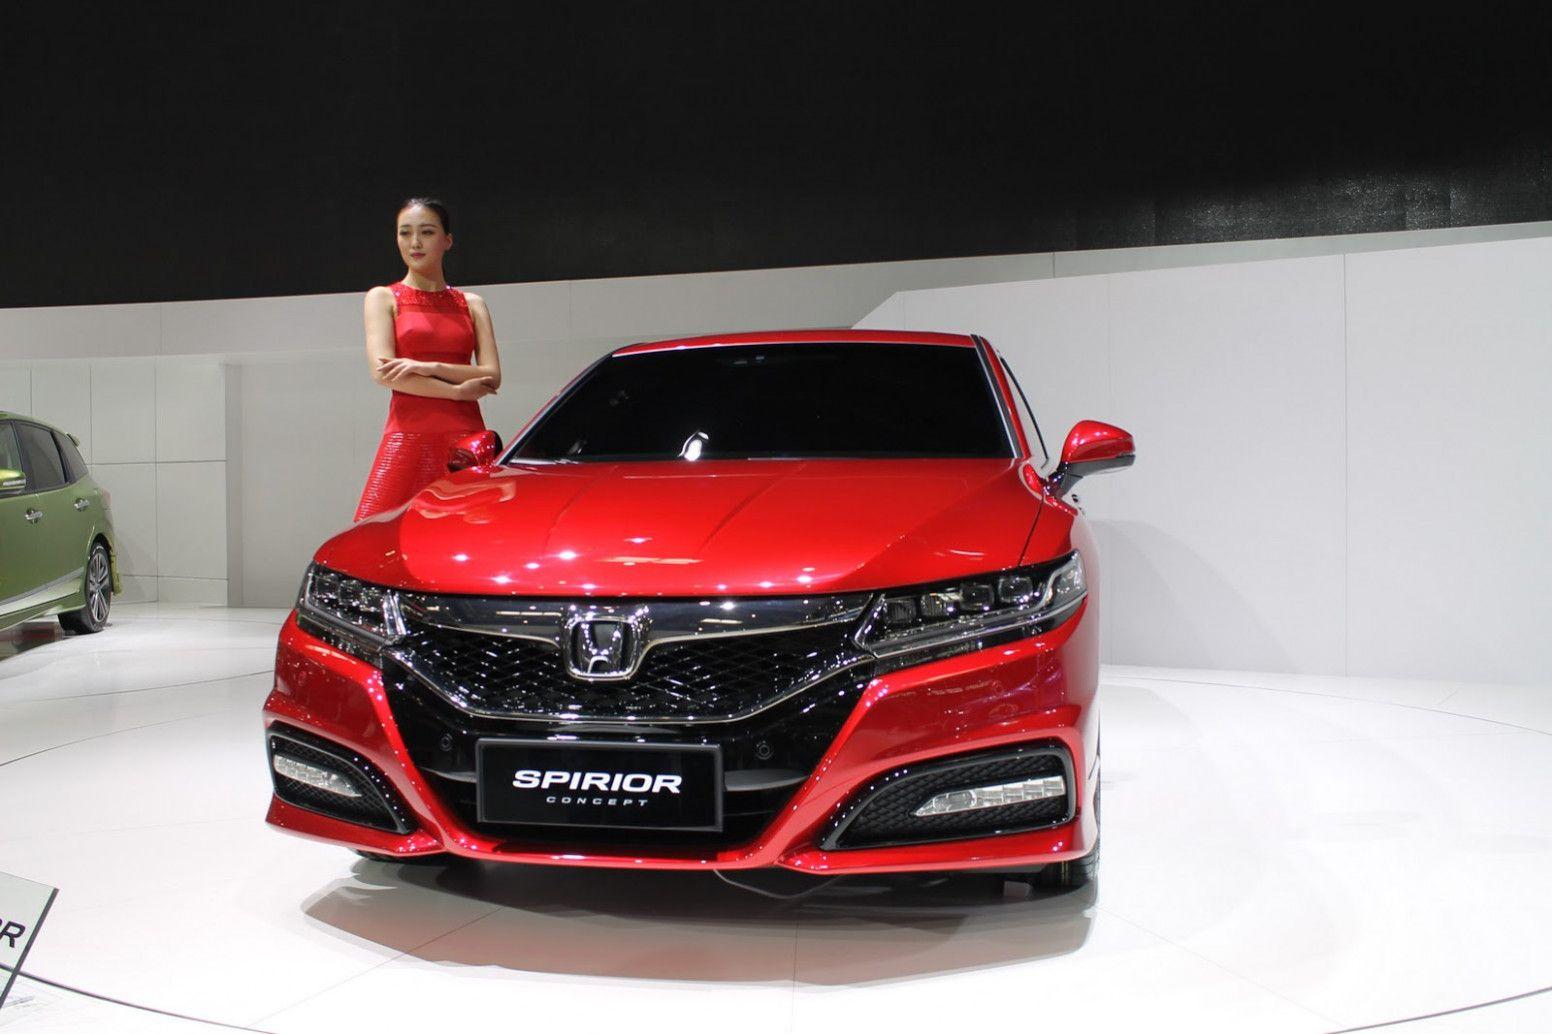 2021 Honda Accord Spirior Pricing 2021 Honda Accord